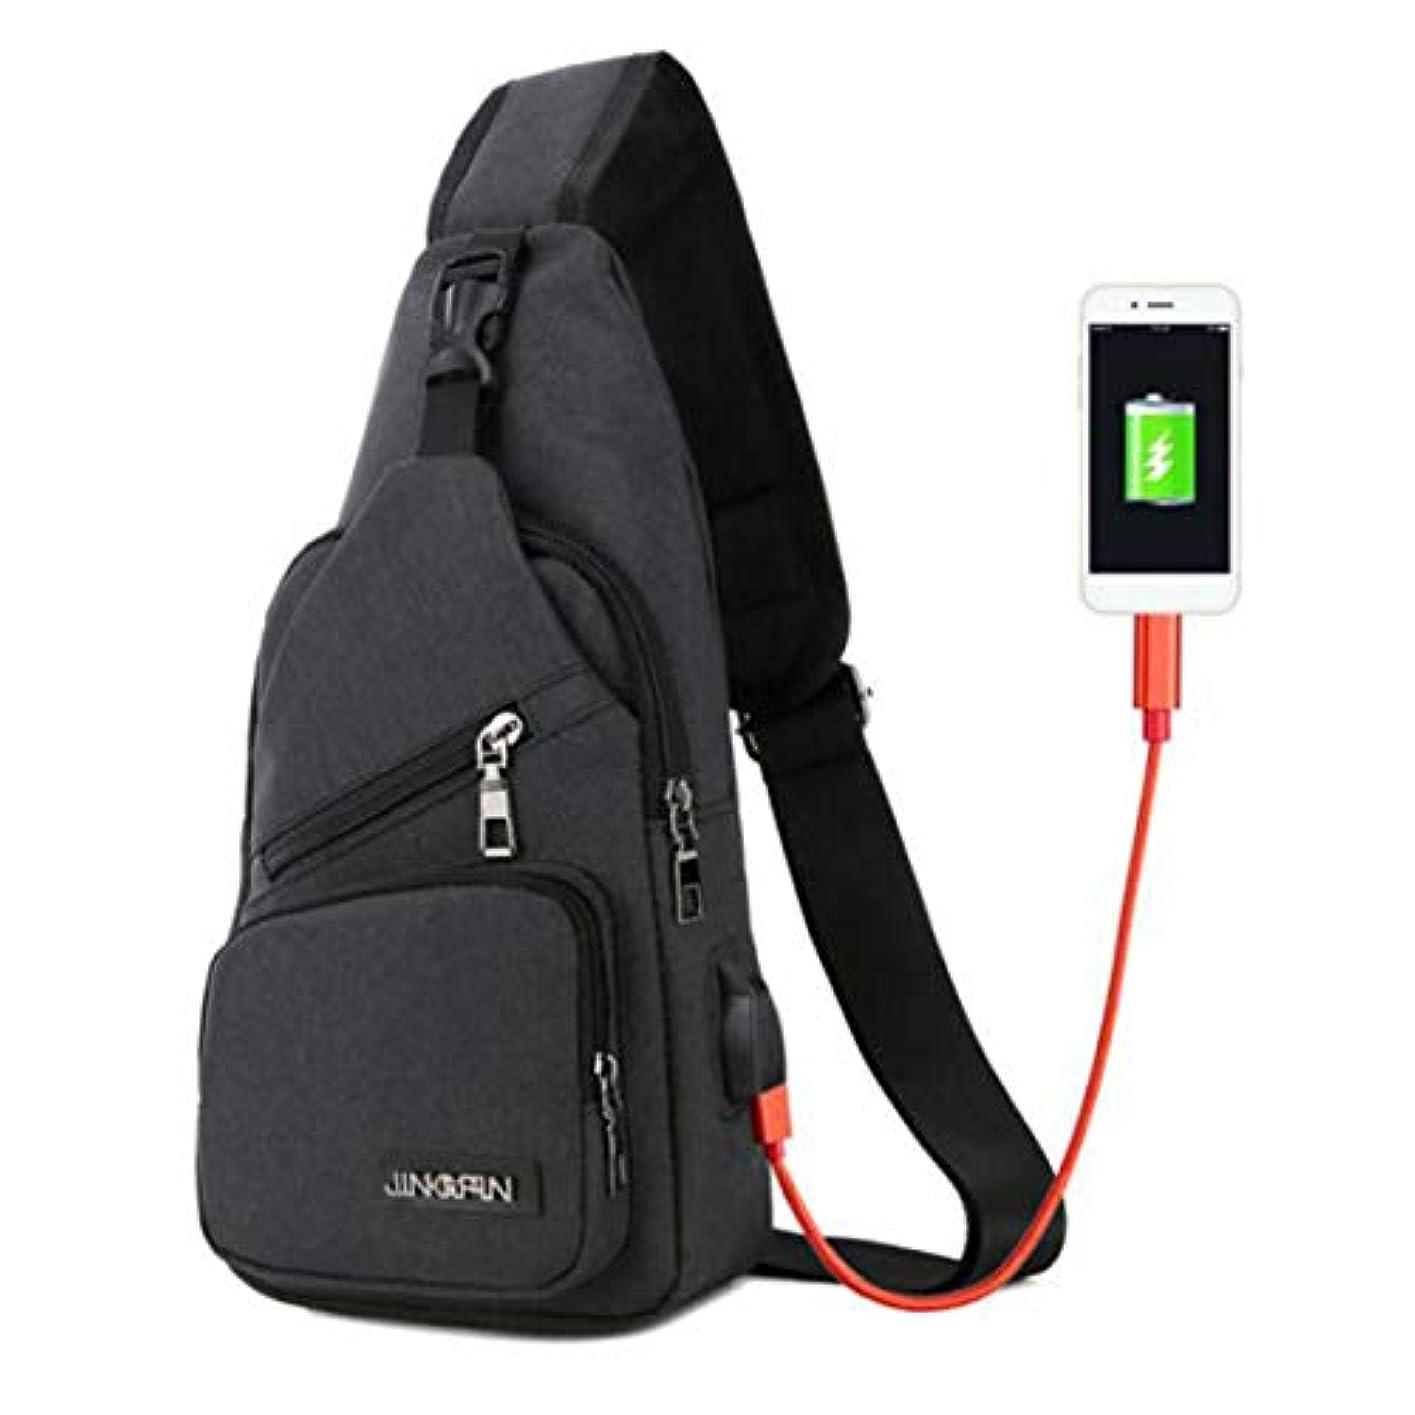 USBメンズクロスボディバッグメンズチェストバッグデザイナーメッセンジャーバッグキャンバスショルダーバッグ斜めのパッケージバックパックトラベル-ブラック